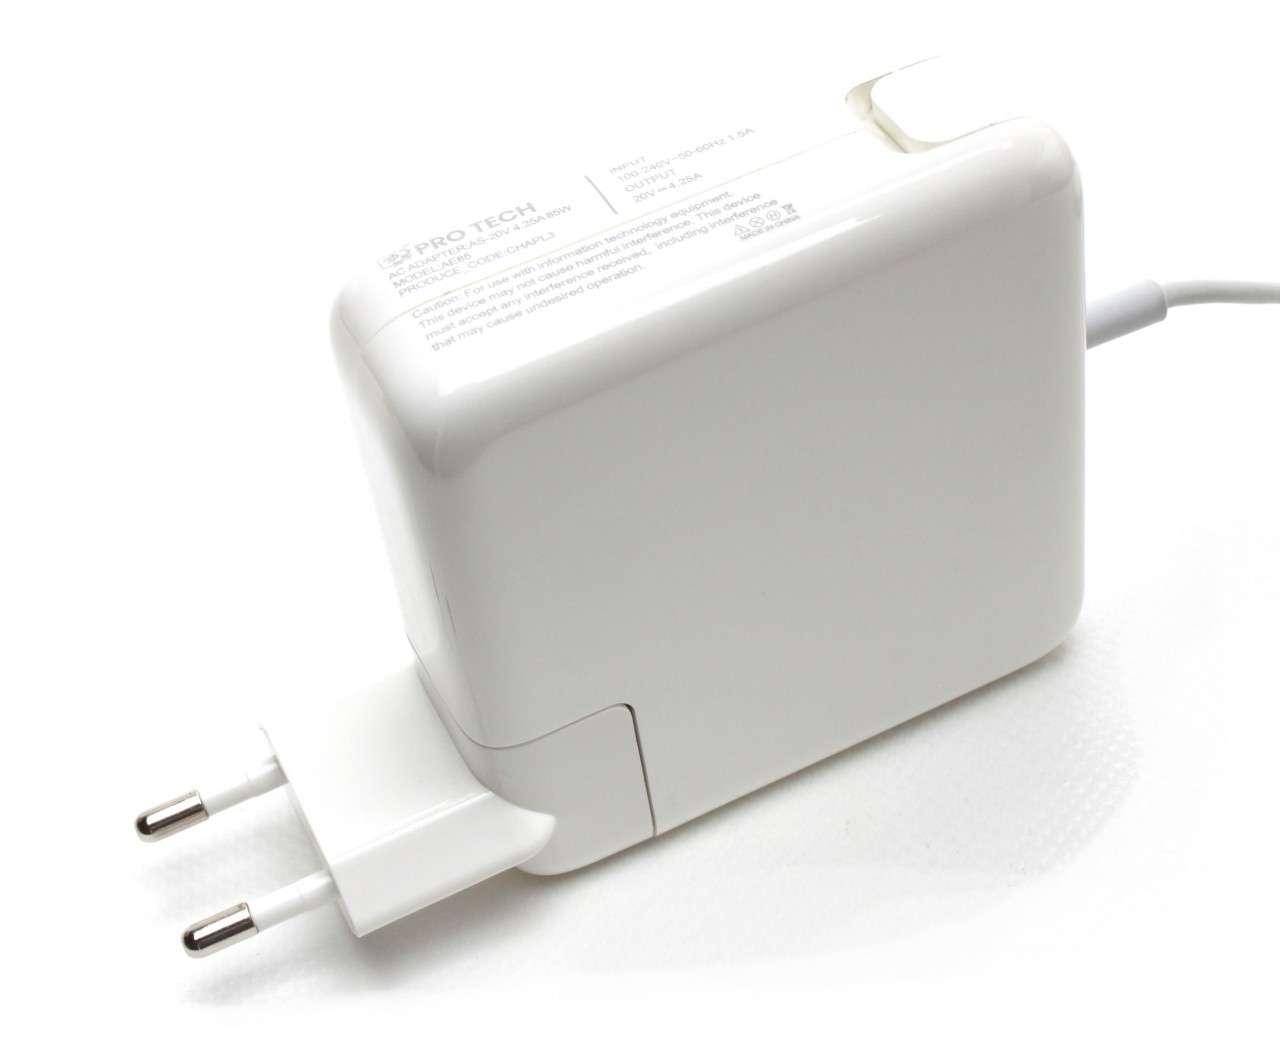 Incarcator Apple MacBook Pro Retina Display 17 inch 85W Replacement imagine powerlaptop.ro 2021